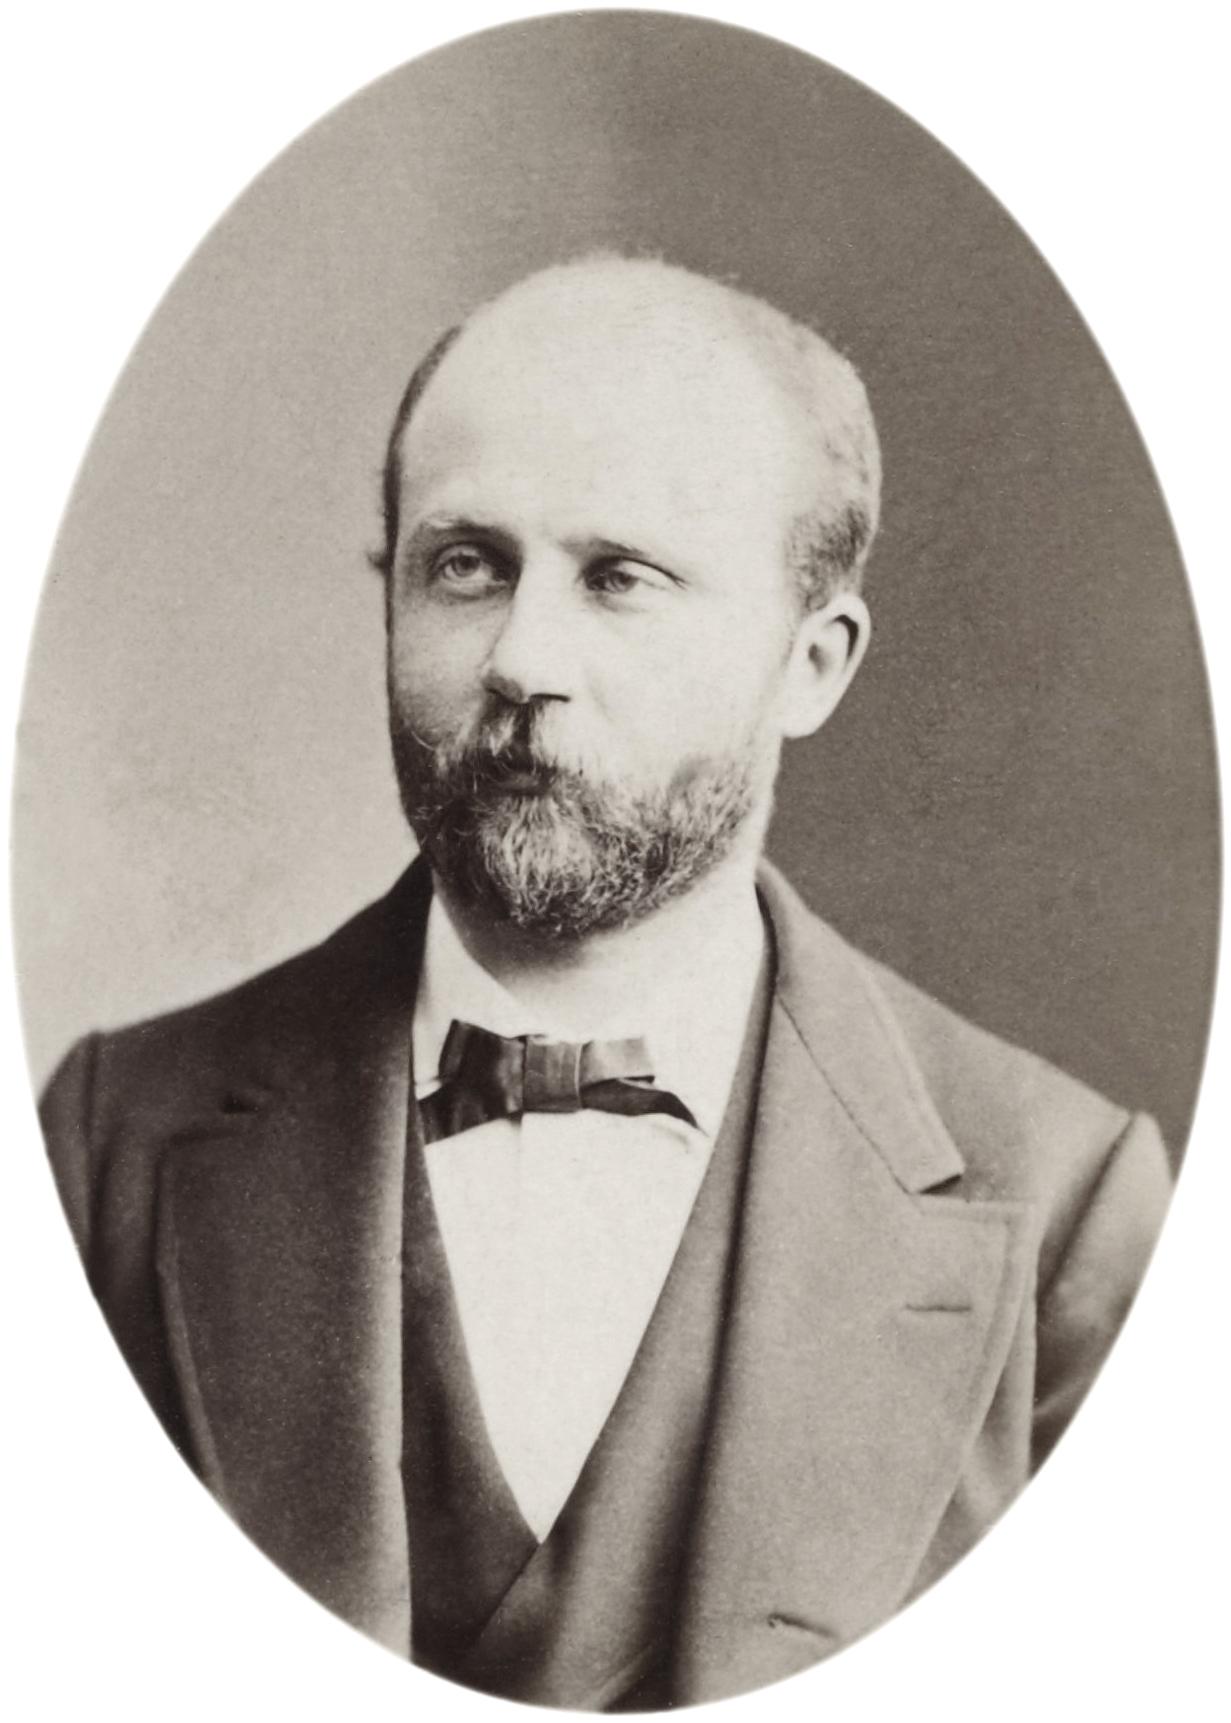 http://upload.wikimedia.org/wikipedia/commons/d/df/Gaston_Maspero_Reutlinger_BNF_Gallica.jpg